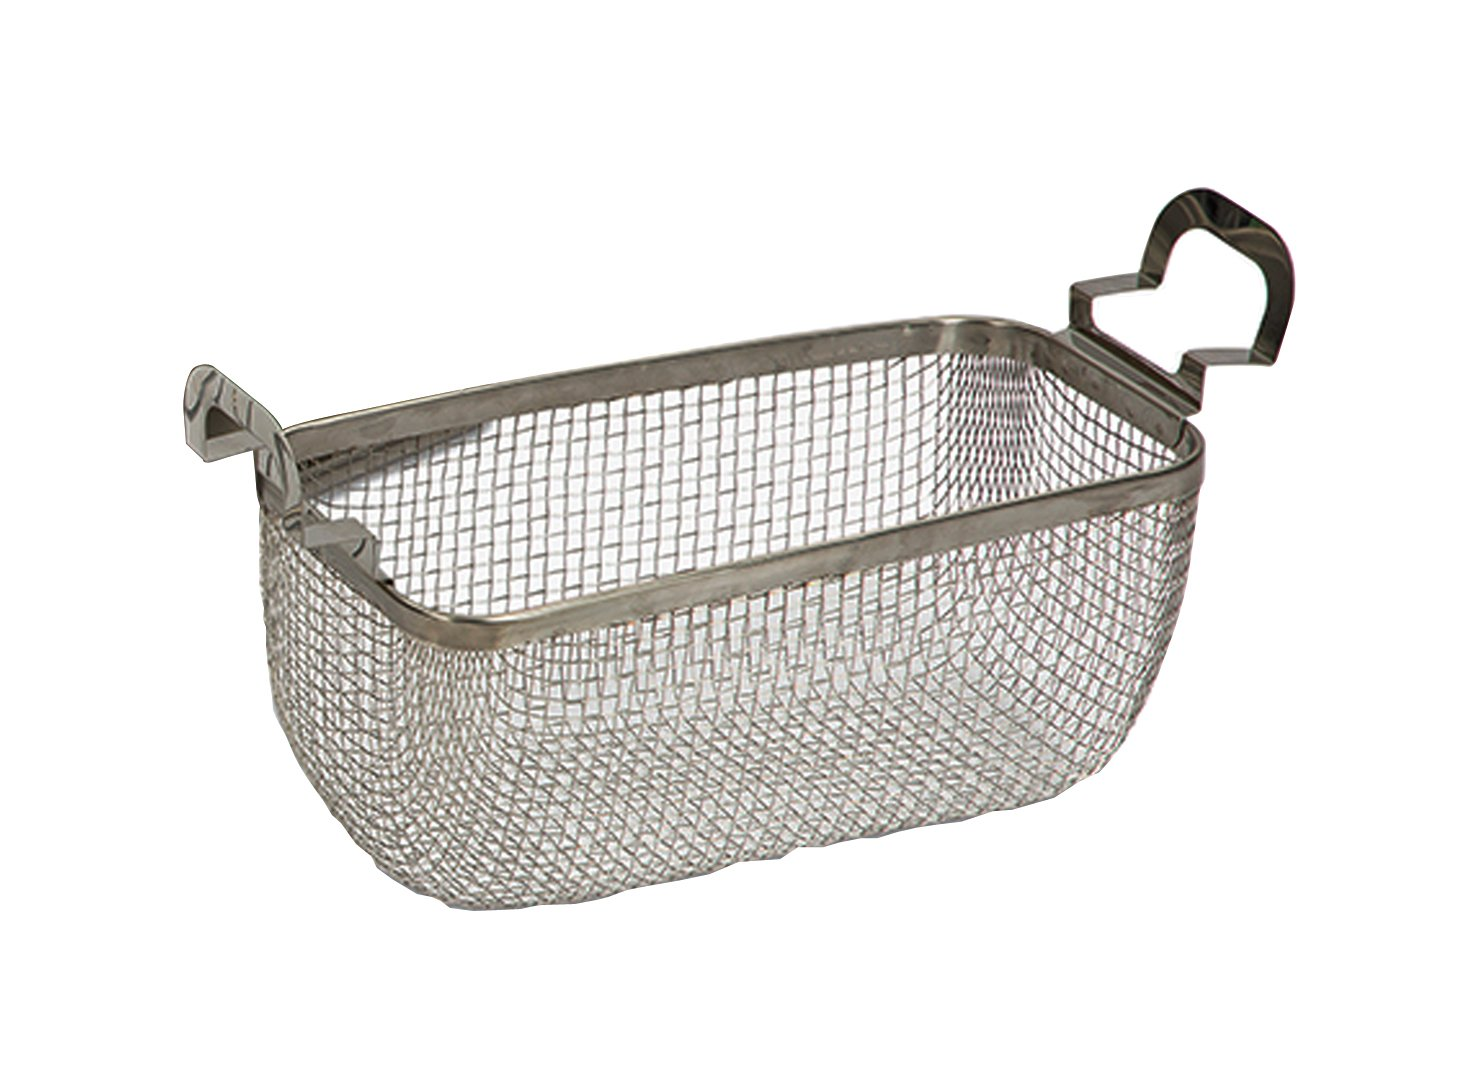 Branson 100-916-335 Stainless Steel Mesh Basket for Model 3800 Bransonic Ultrasonic Cleaners, 1/4'' Mesh Size by Branson Ultrasonics